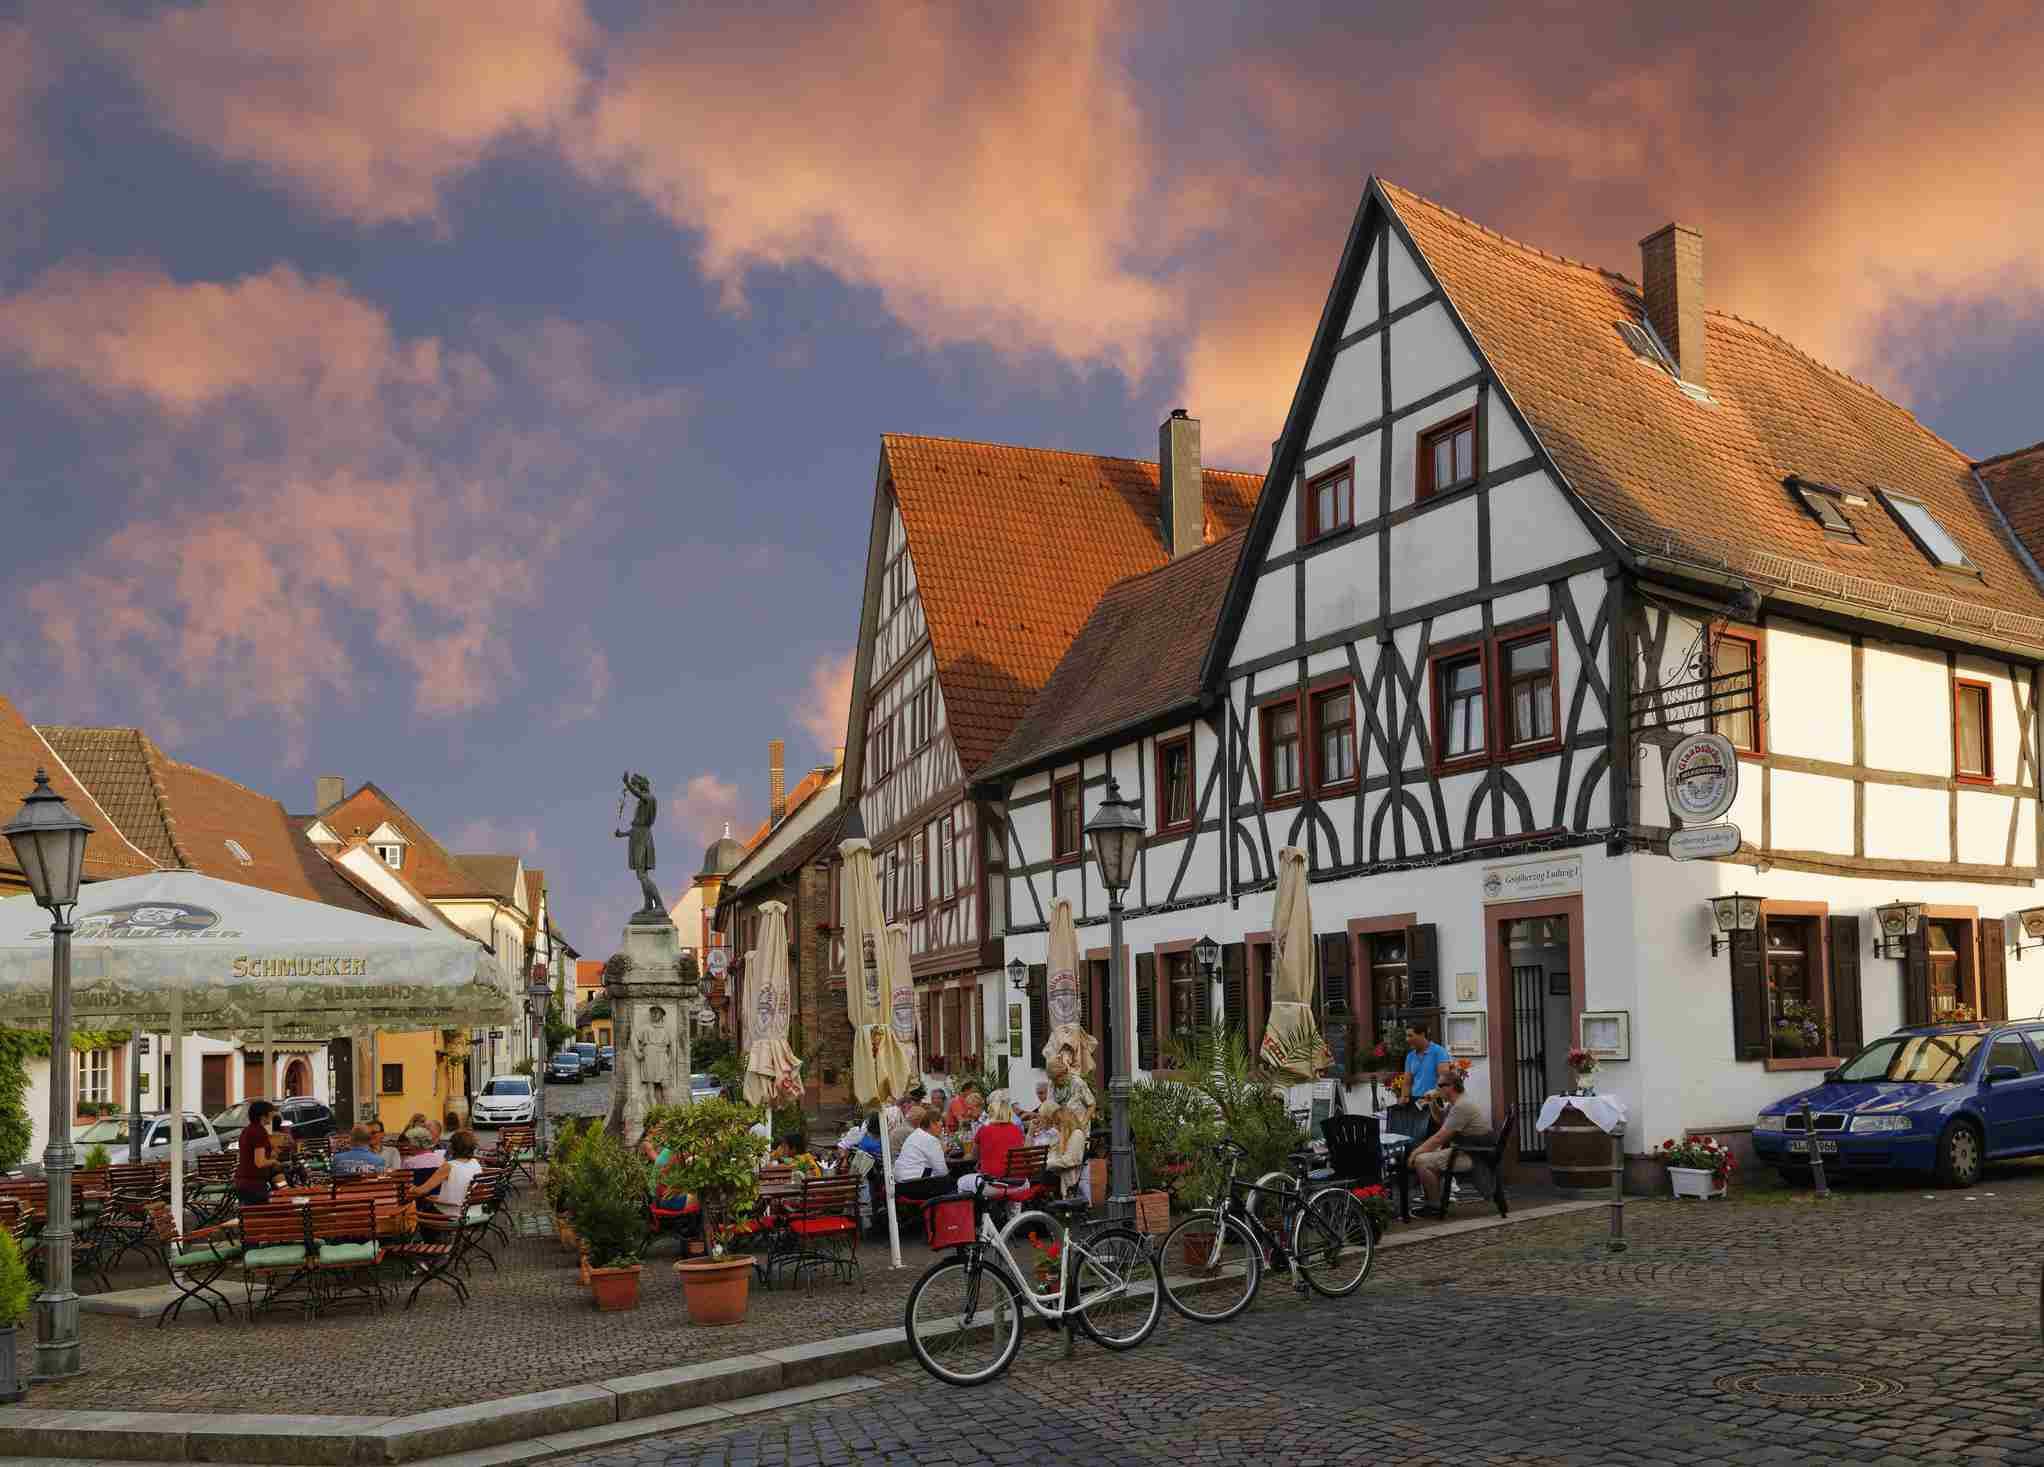 Alemania, Hesse, Hanau, Steinheim am Main, Platz des Friedens